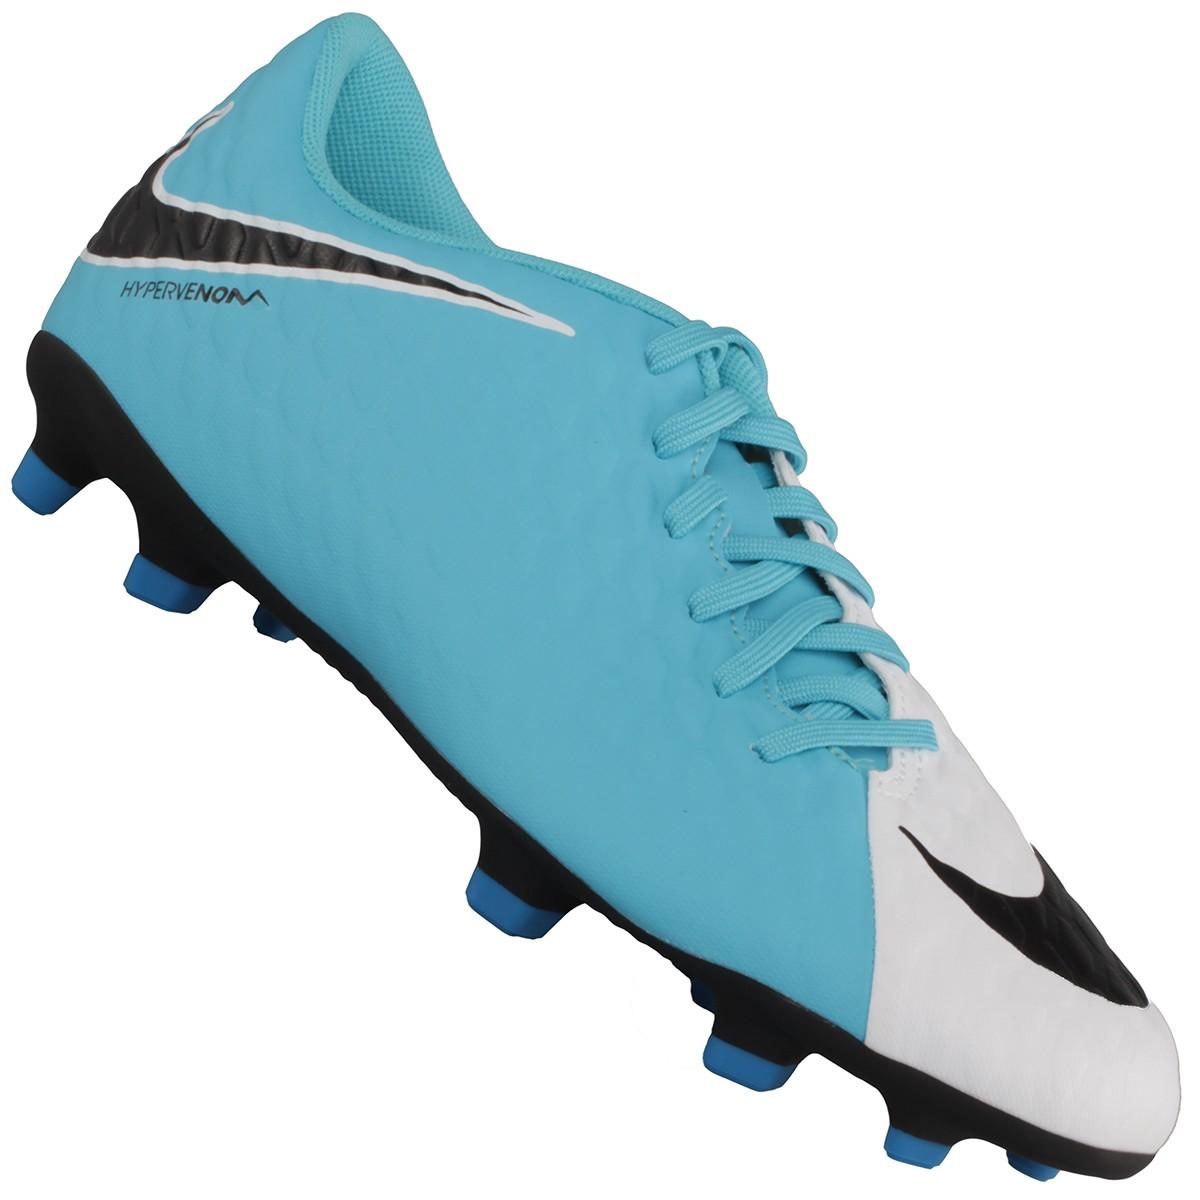 eaead9e290 Chuteira Nike Hypervenom Phade 3 FG